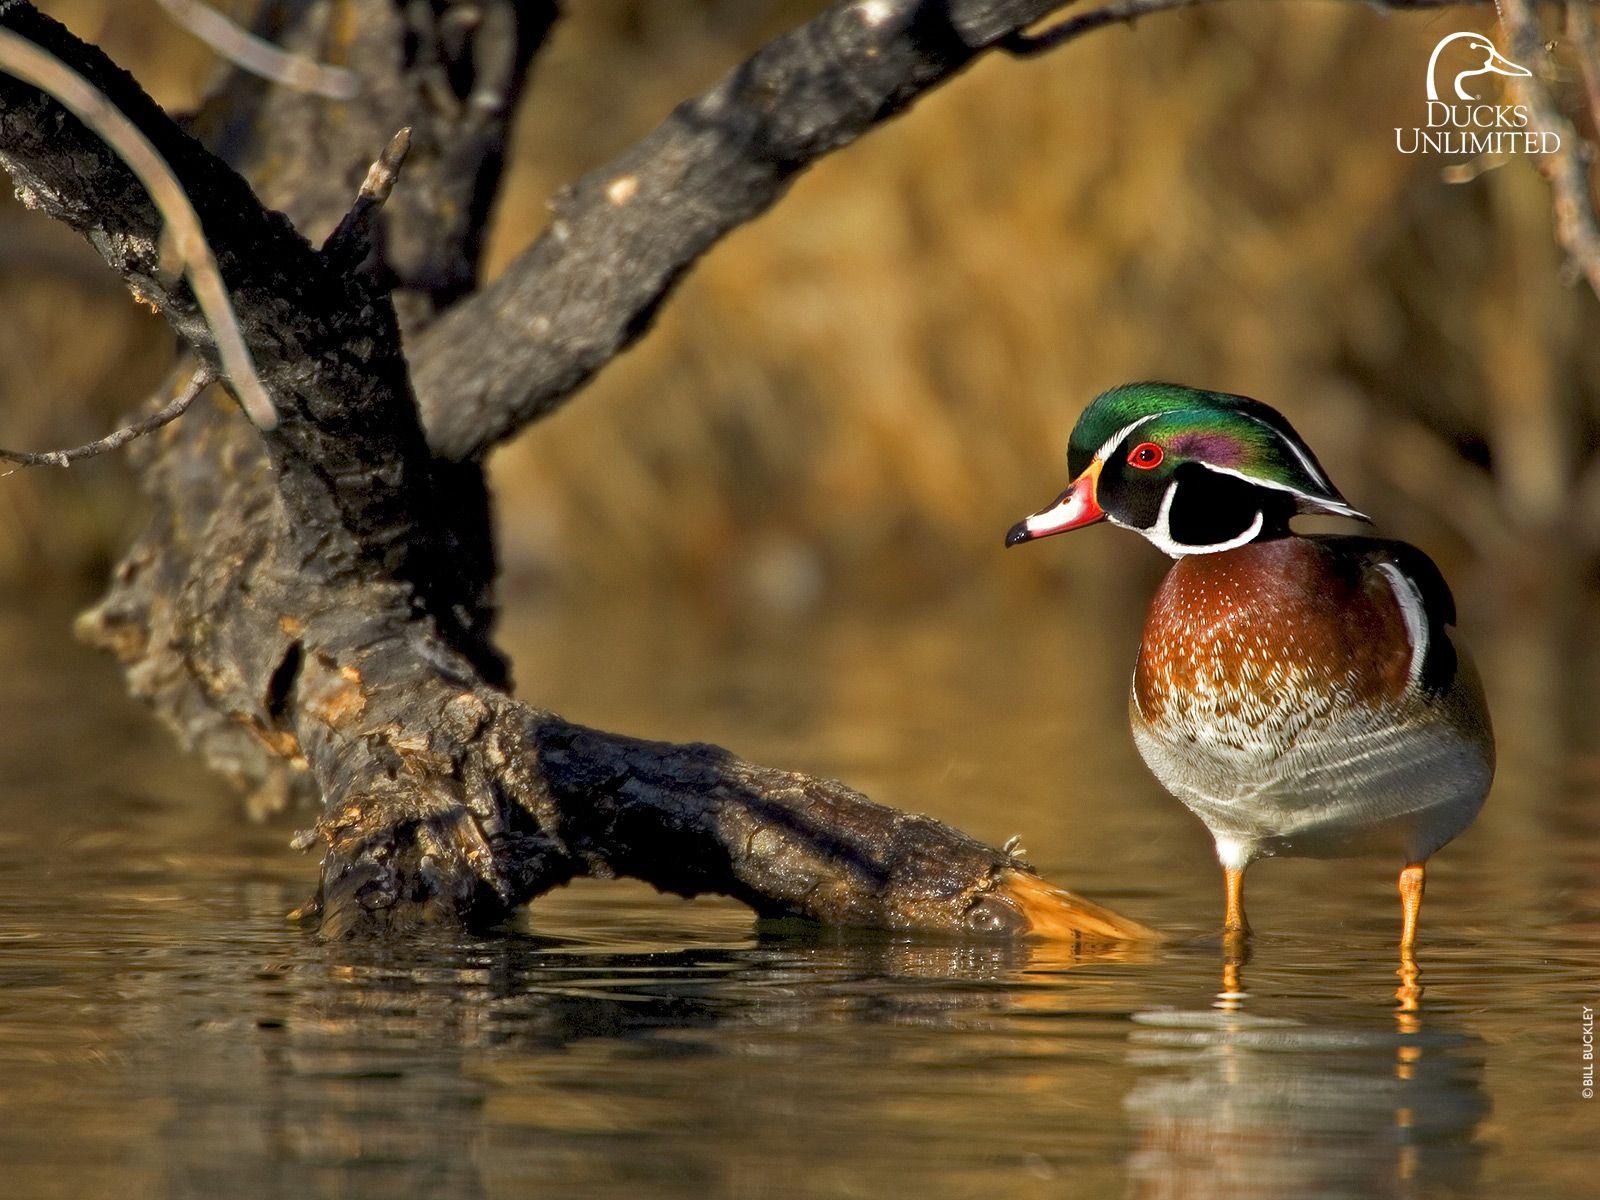 Duck Hunting Supplies And Retriever Training Gear Duck Waterfowl